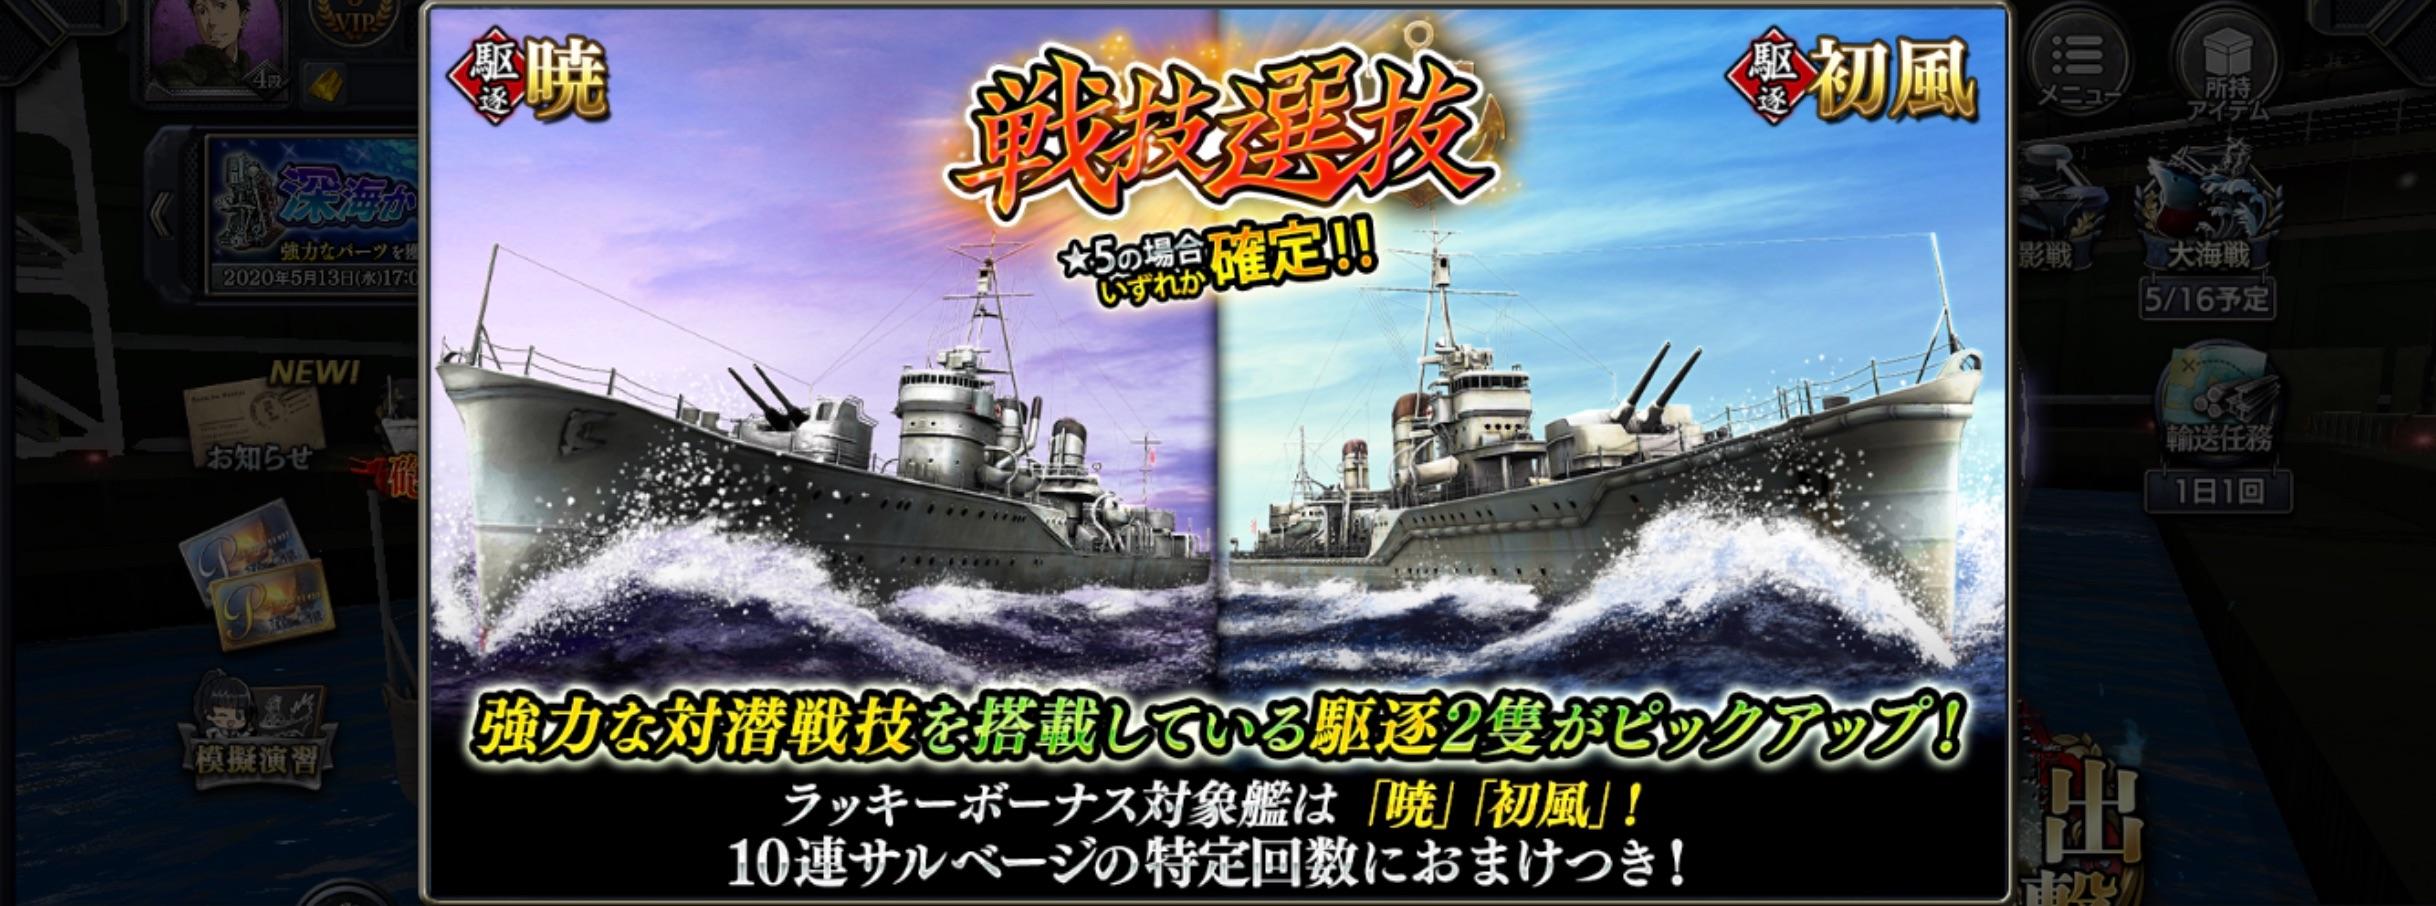 Hatsukaze-salvage